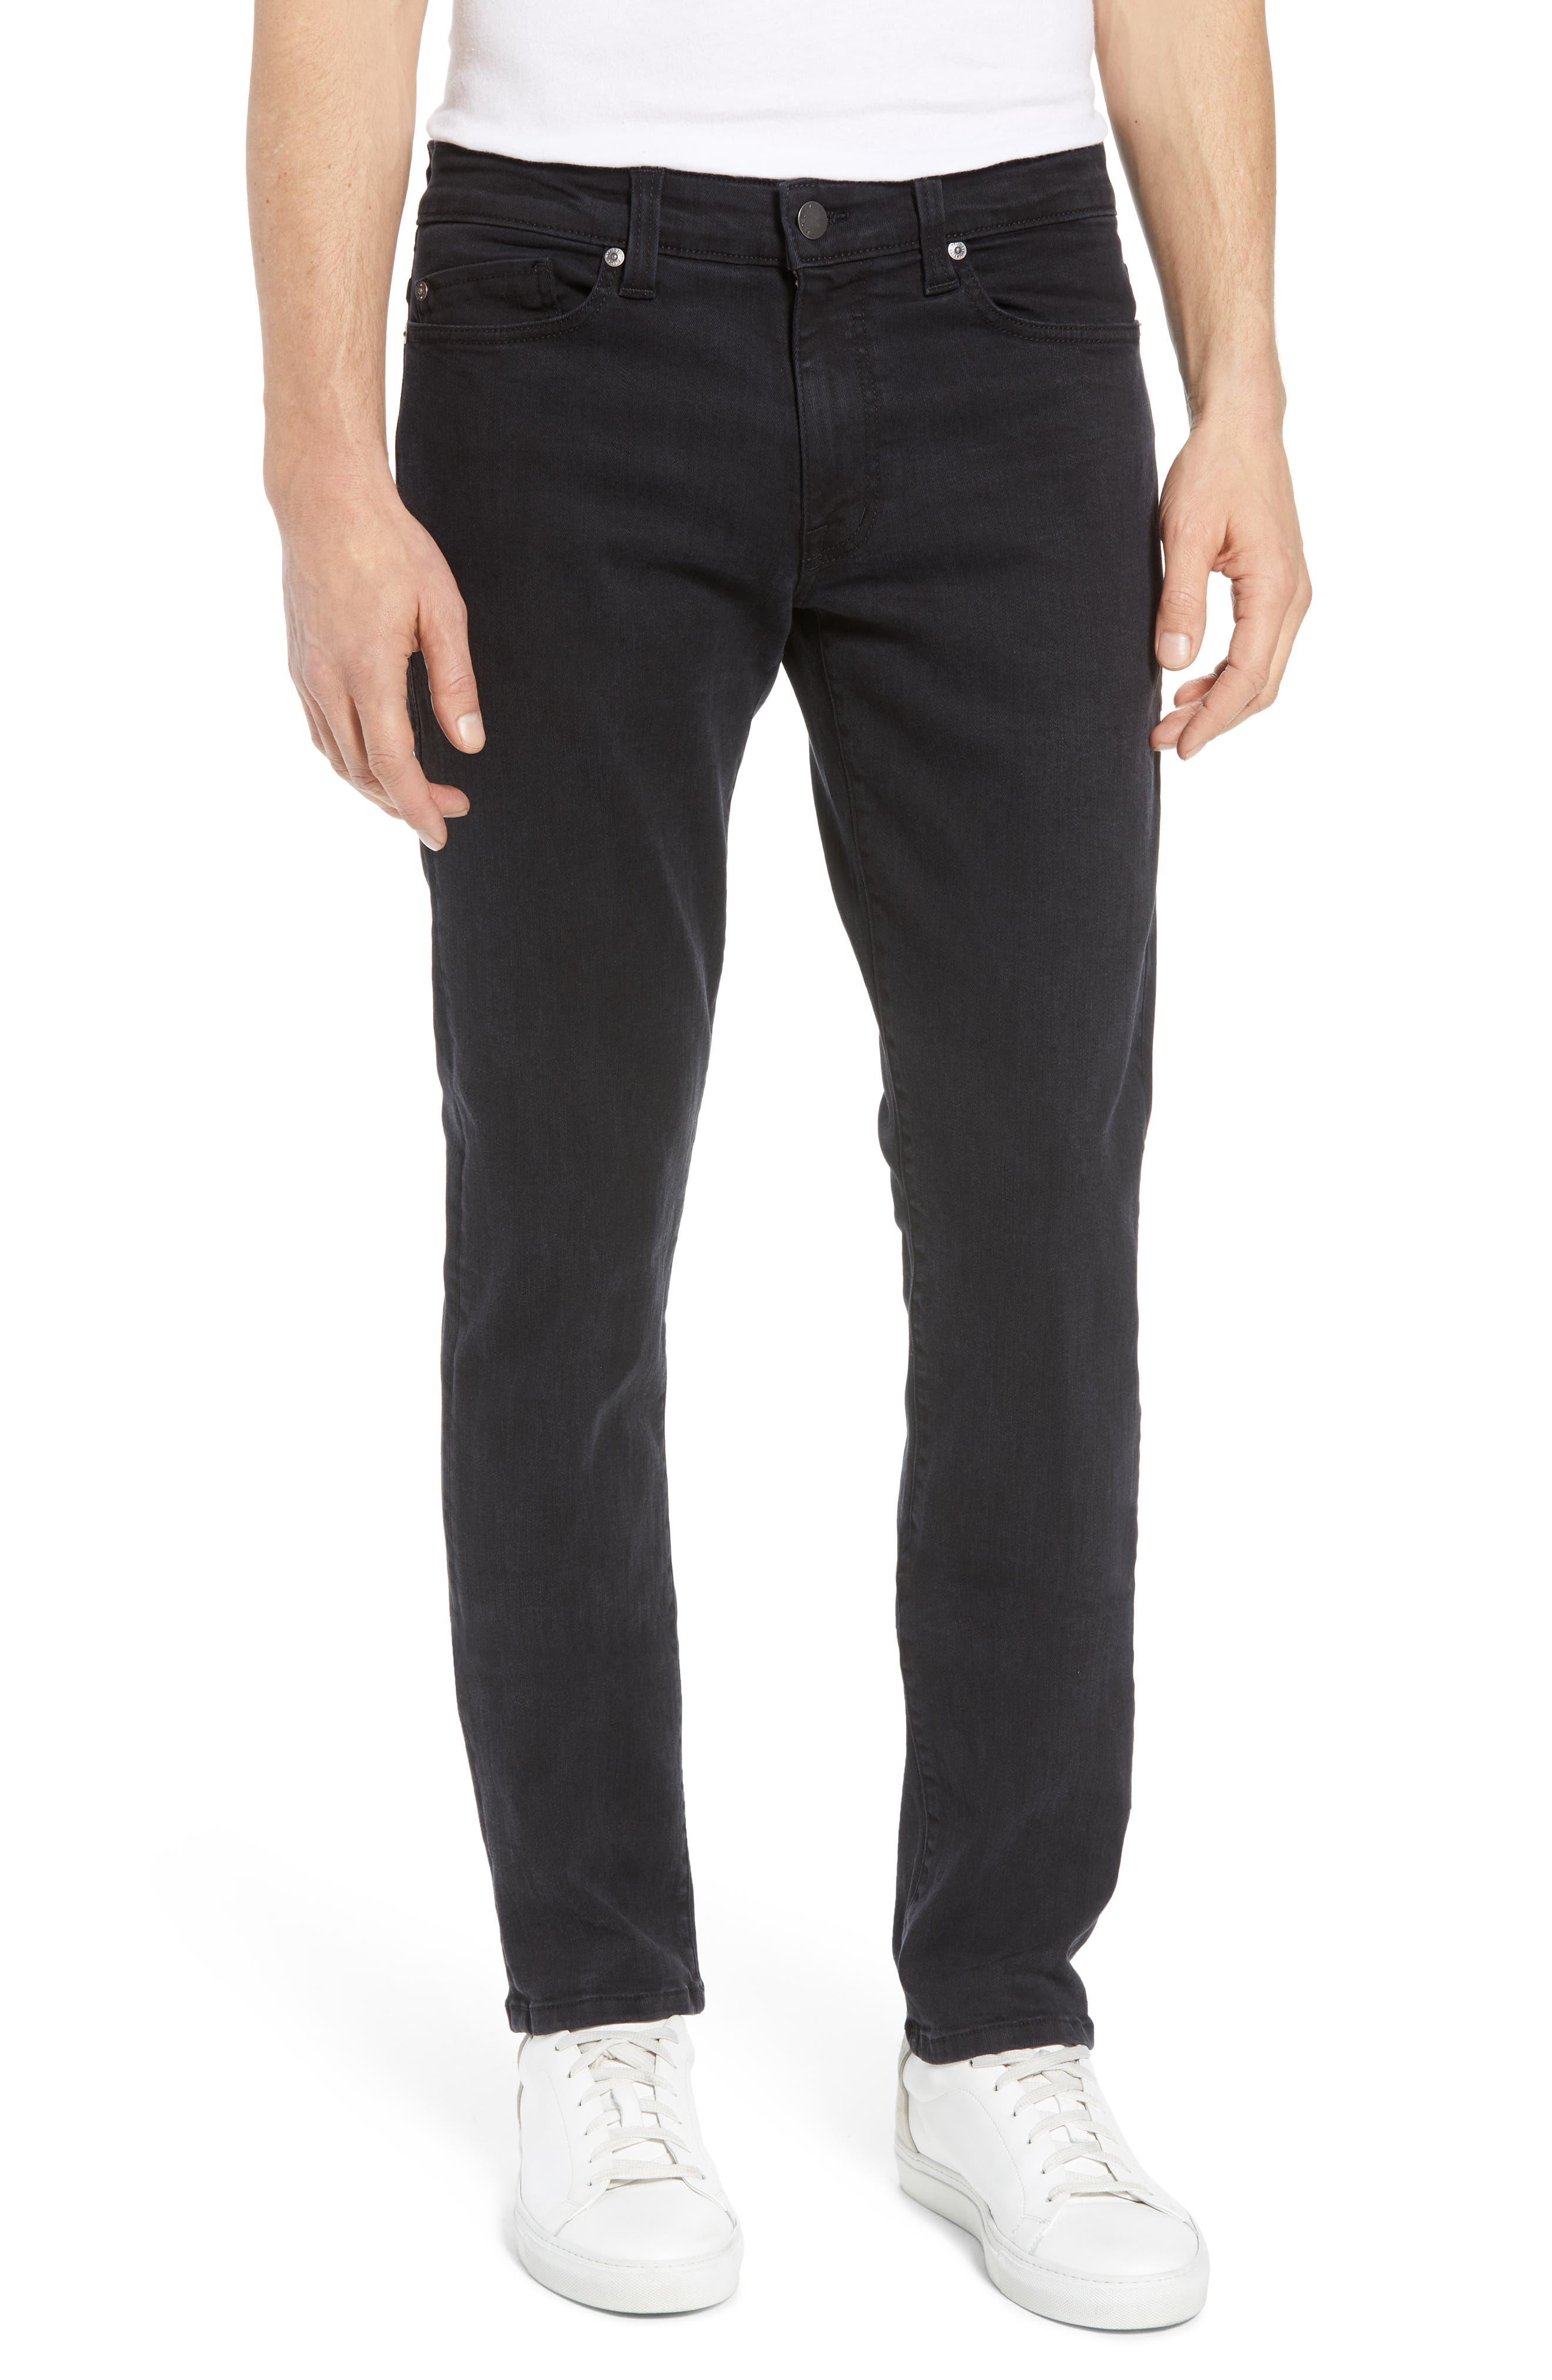 Torino Slim Fit Jeans,                         Main,                         color, 001